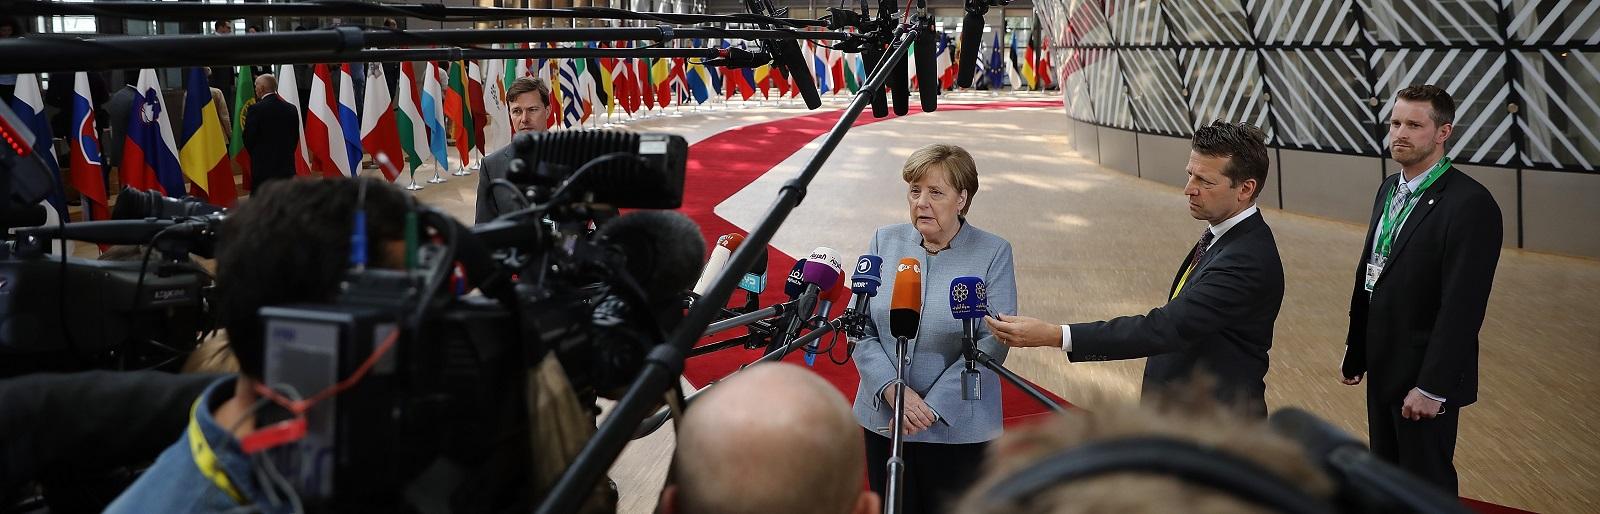 Angela Merkel speaks to the media ahead of an EU Council meeting in Brussels in April. (Photo: Dan Kitwood/Getty Images)